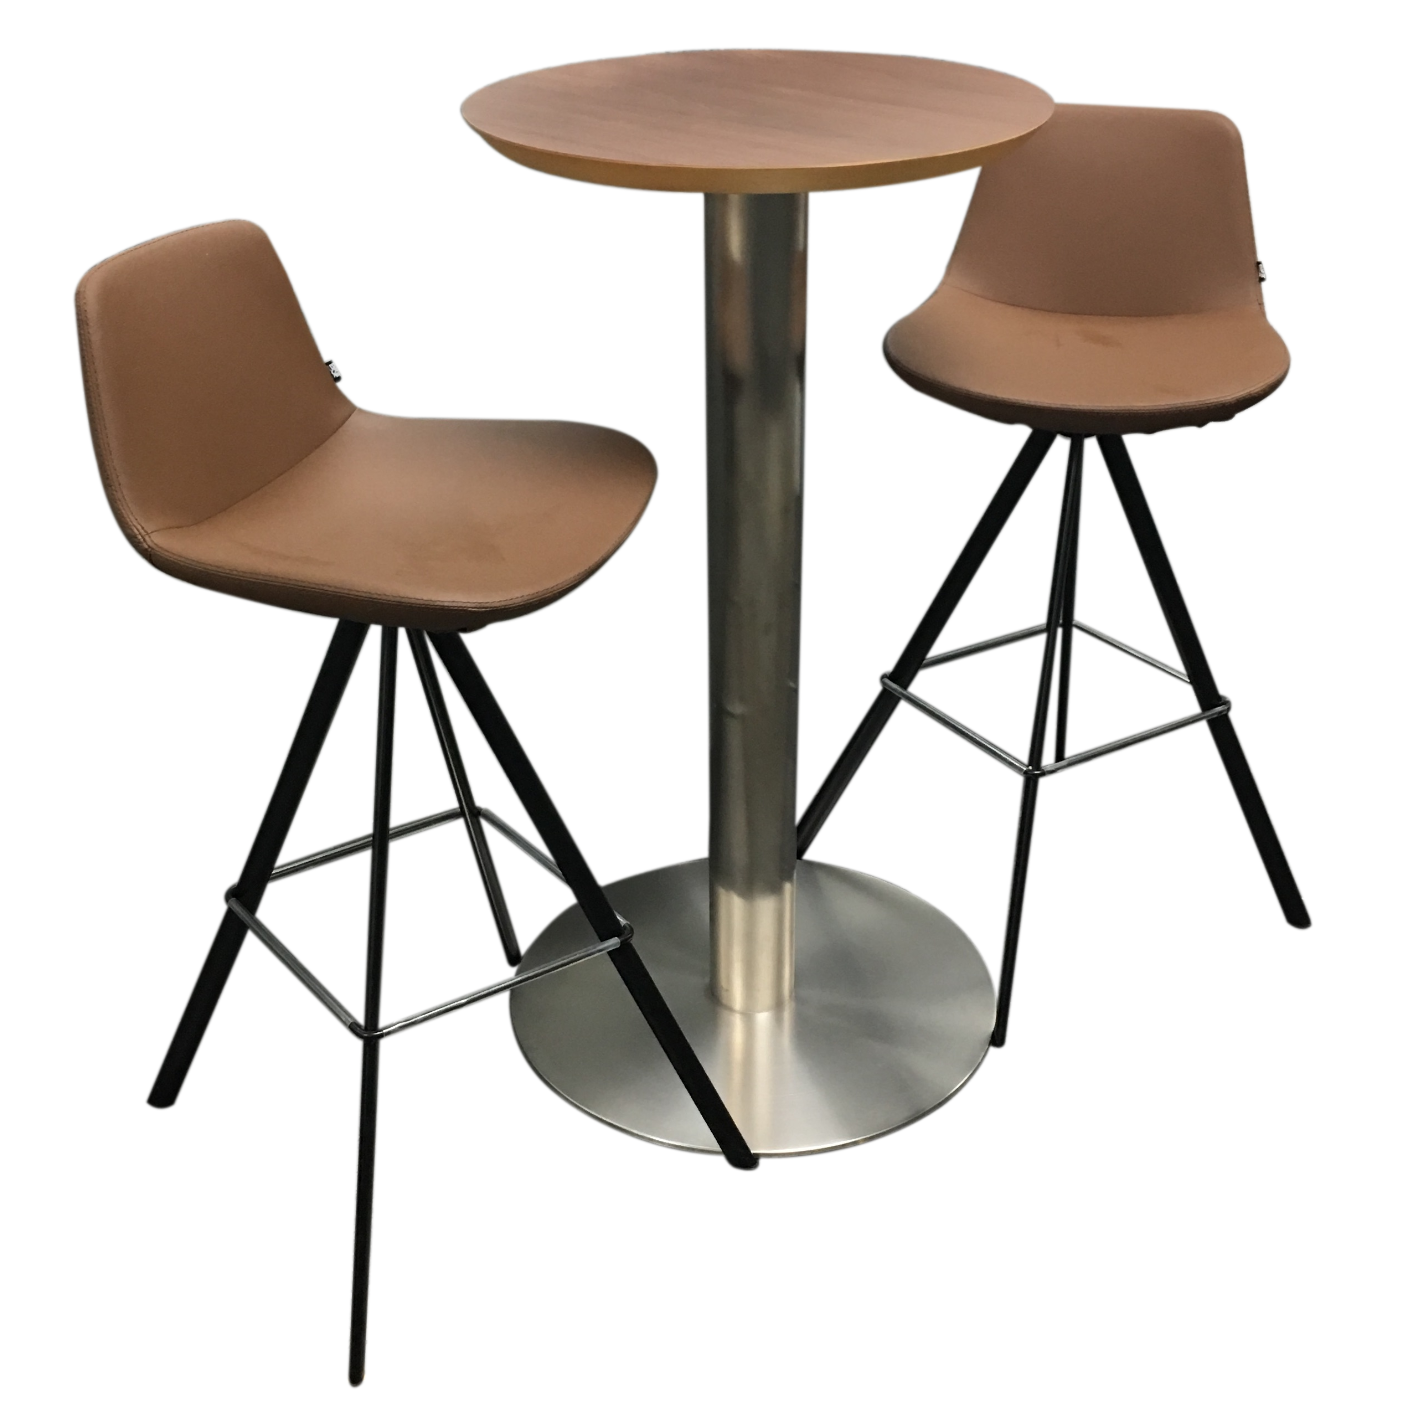 boconcept bar table swivel bar stools set of 3 chairish. Black Bedroom Furniture Sets. Home Design Ideas